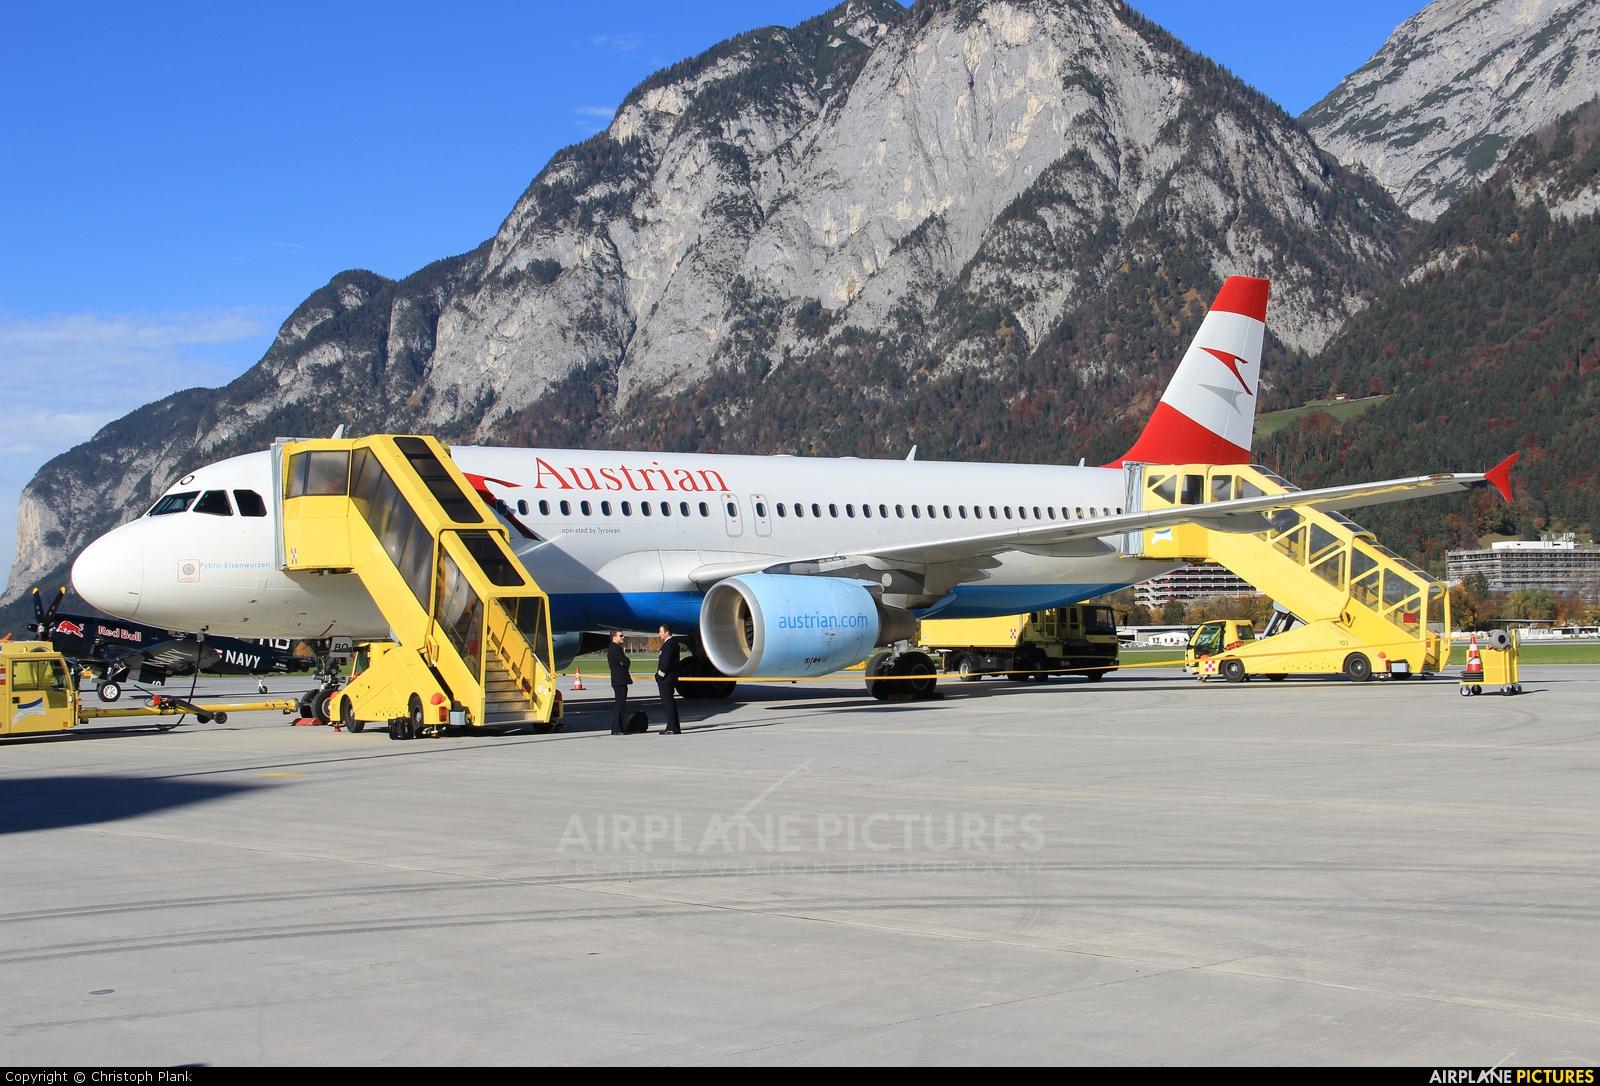 Austrian Airlines/Arrows/Tyrolean OE-LBO aircraft at Innsbruck